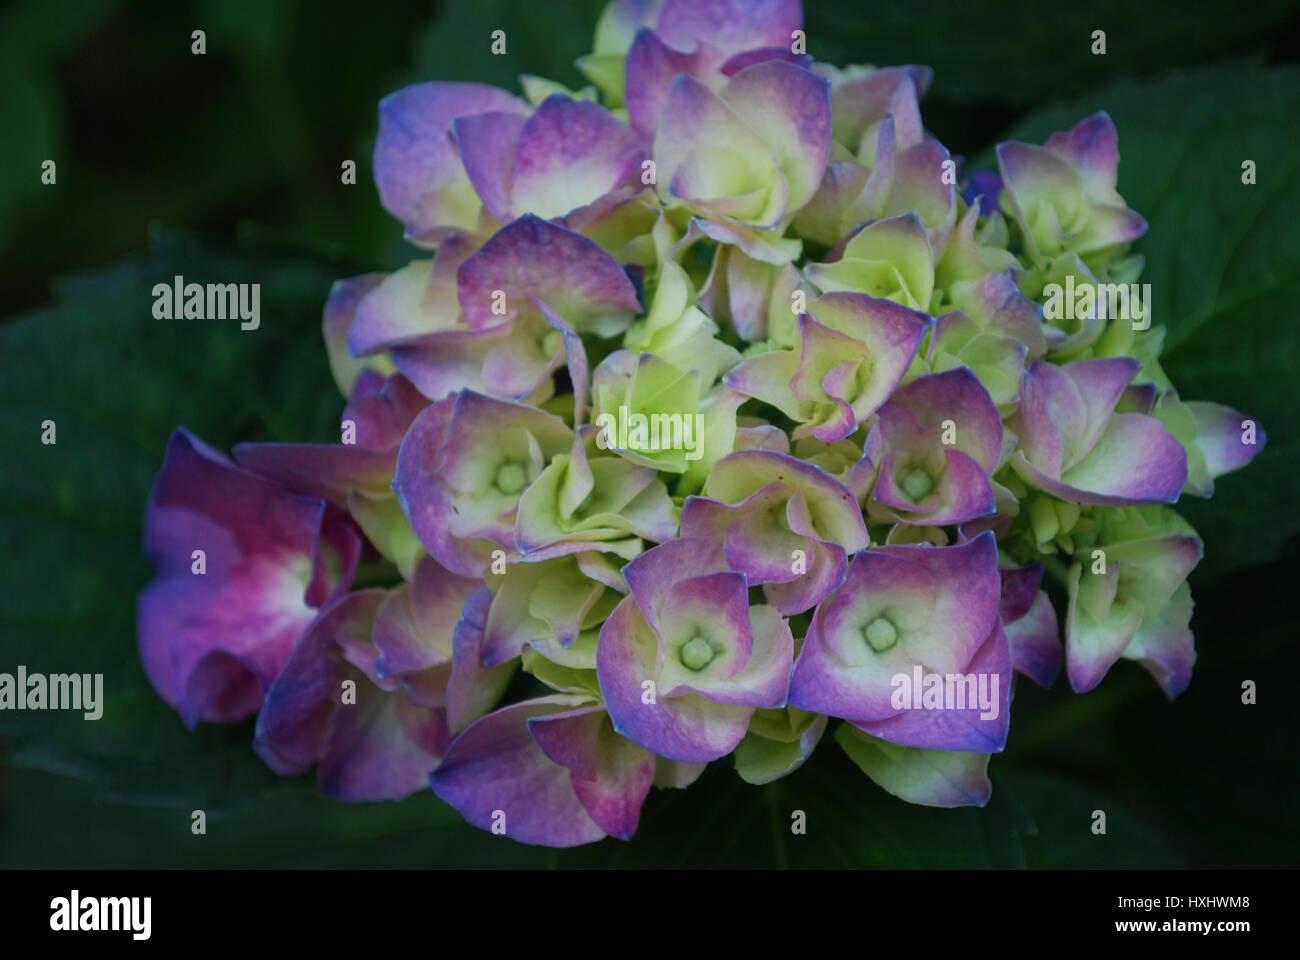 Budding And Blooming White And Purple Flowering Hydrangea Bush Stock